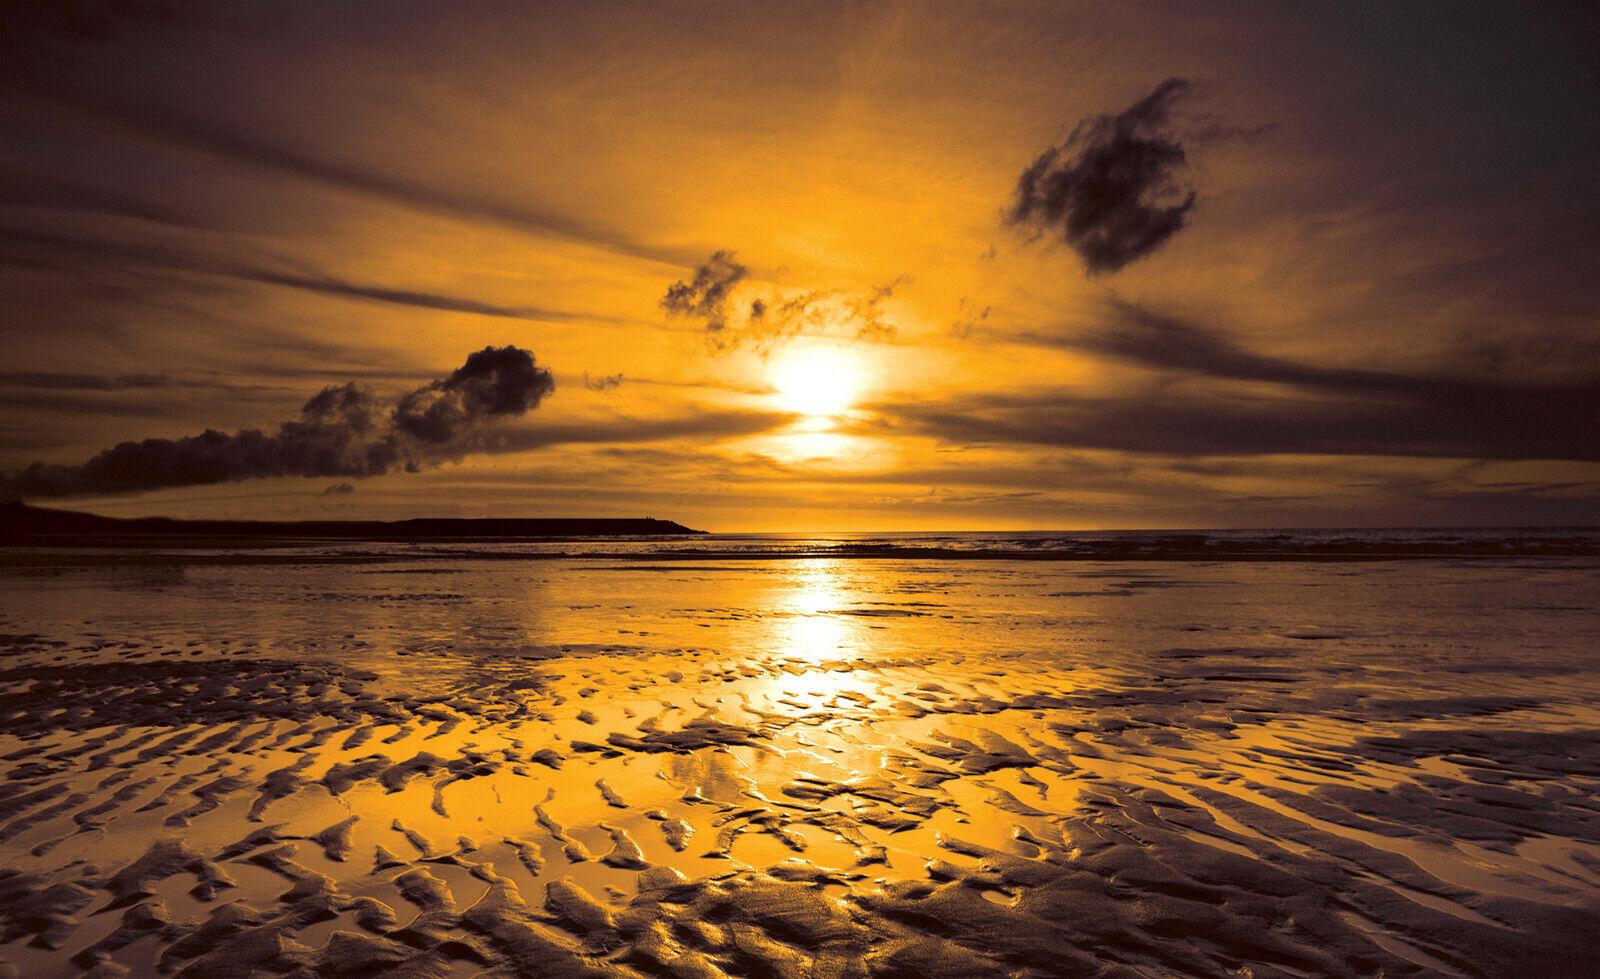 VLIES Fototapete-SONNENUNTERGANG-(261)-Meer Strand Dünen Beach Karibik Südsee